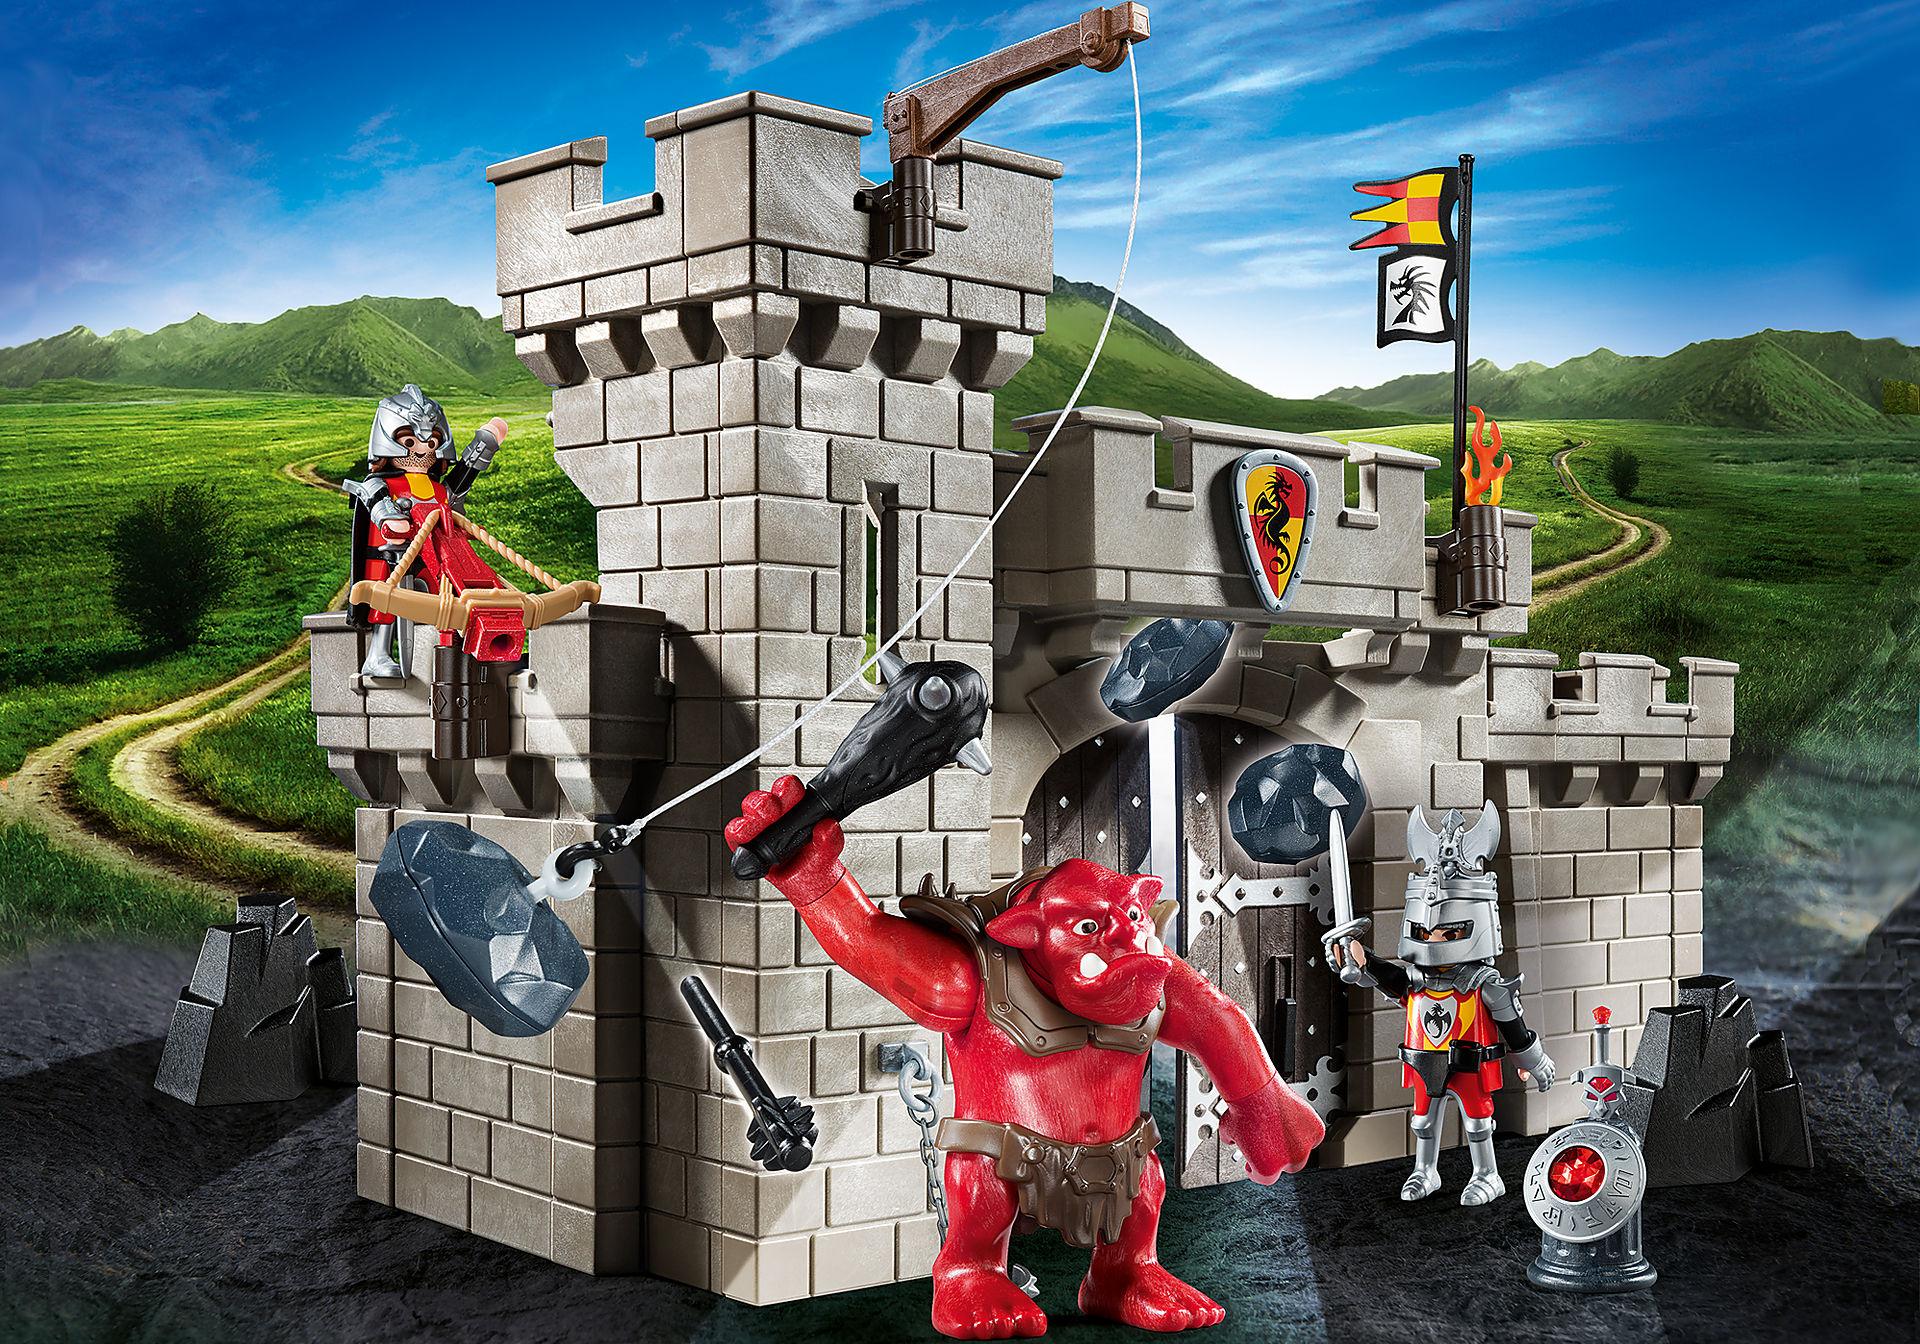 Playmobil 5670 - Citadelle des chevaliers